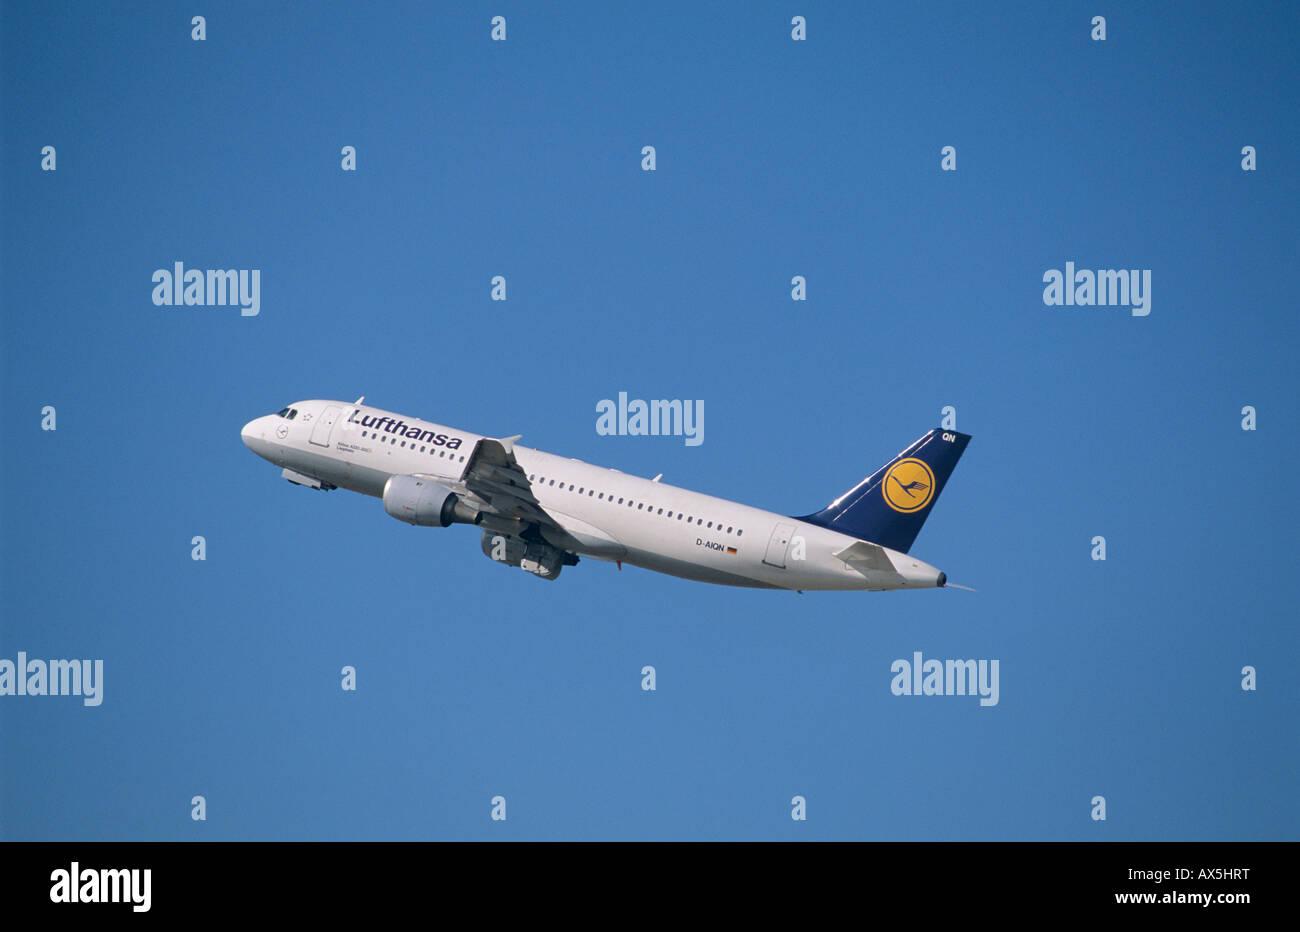 Lufthansa Airbus A 320-200, climb - Stock Image